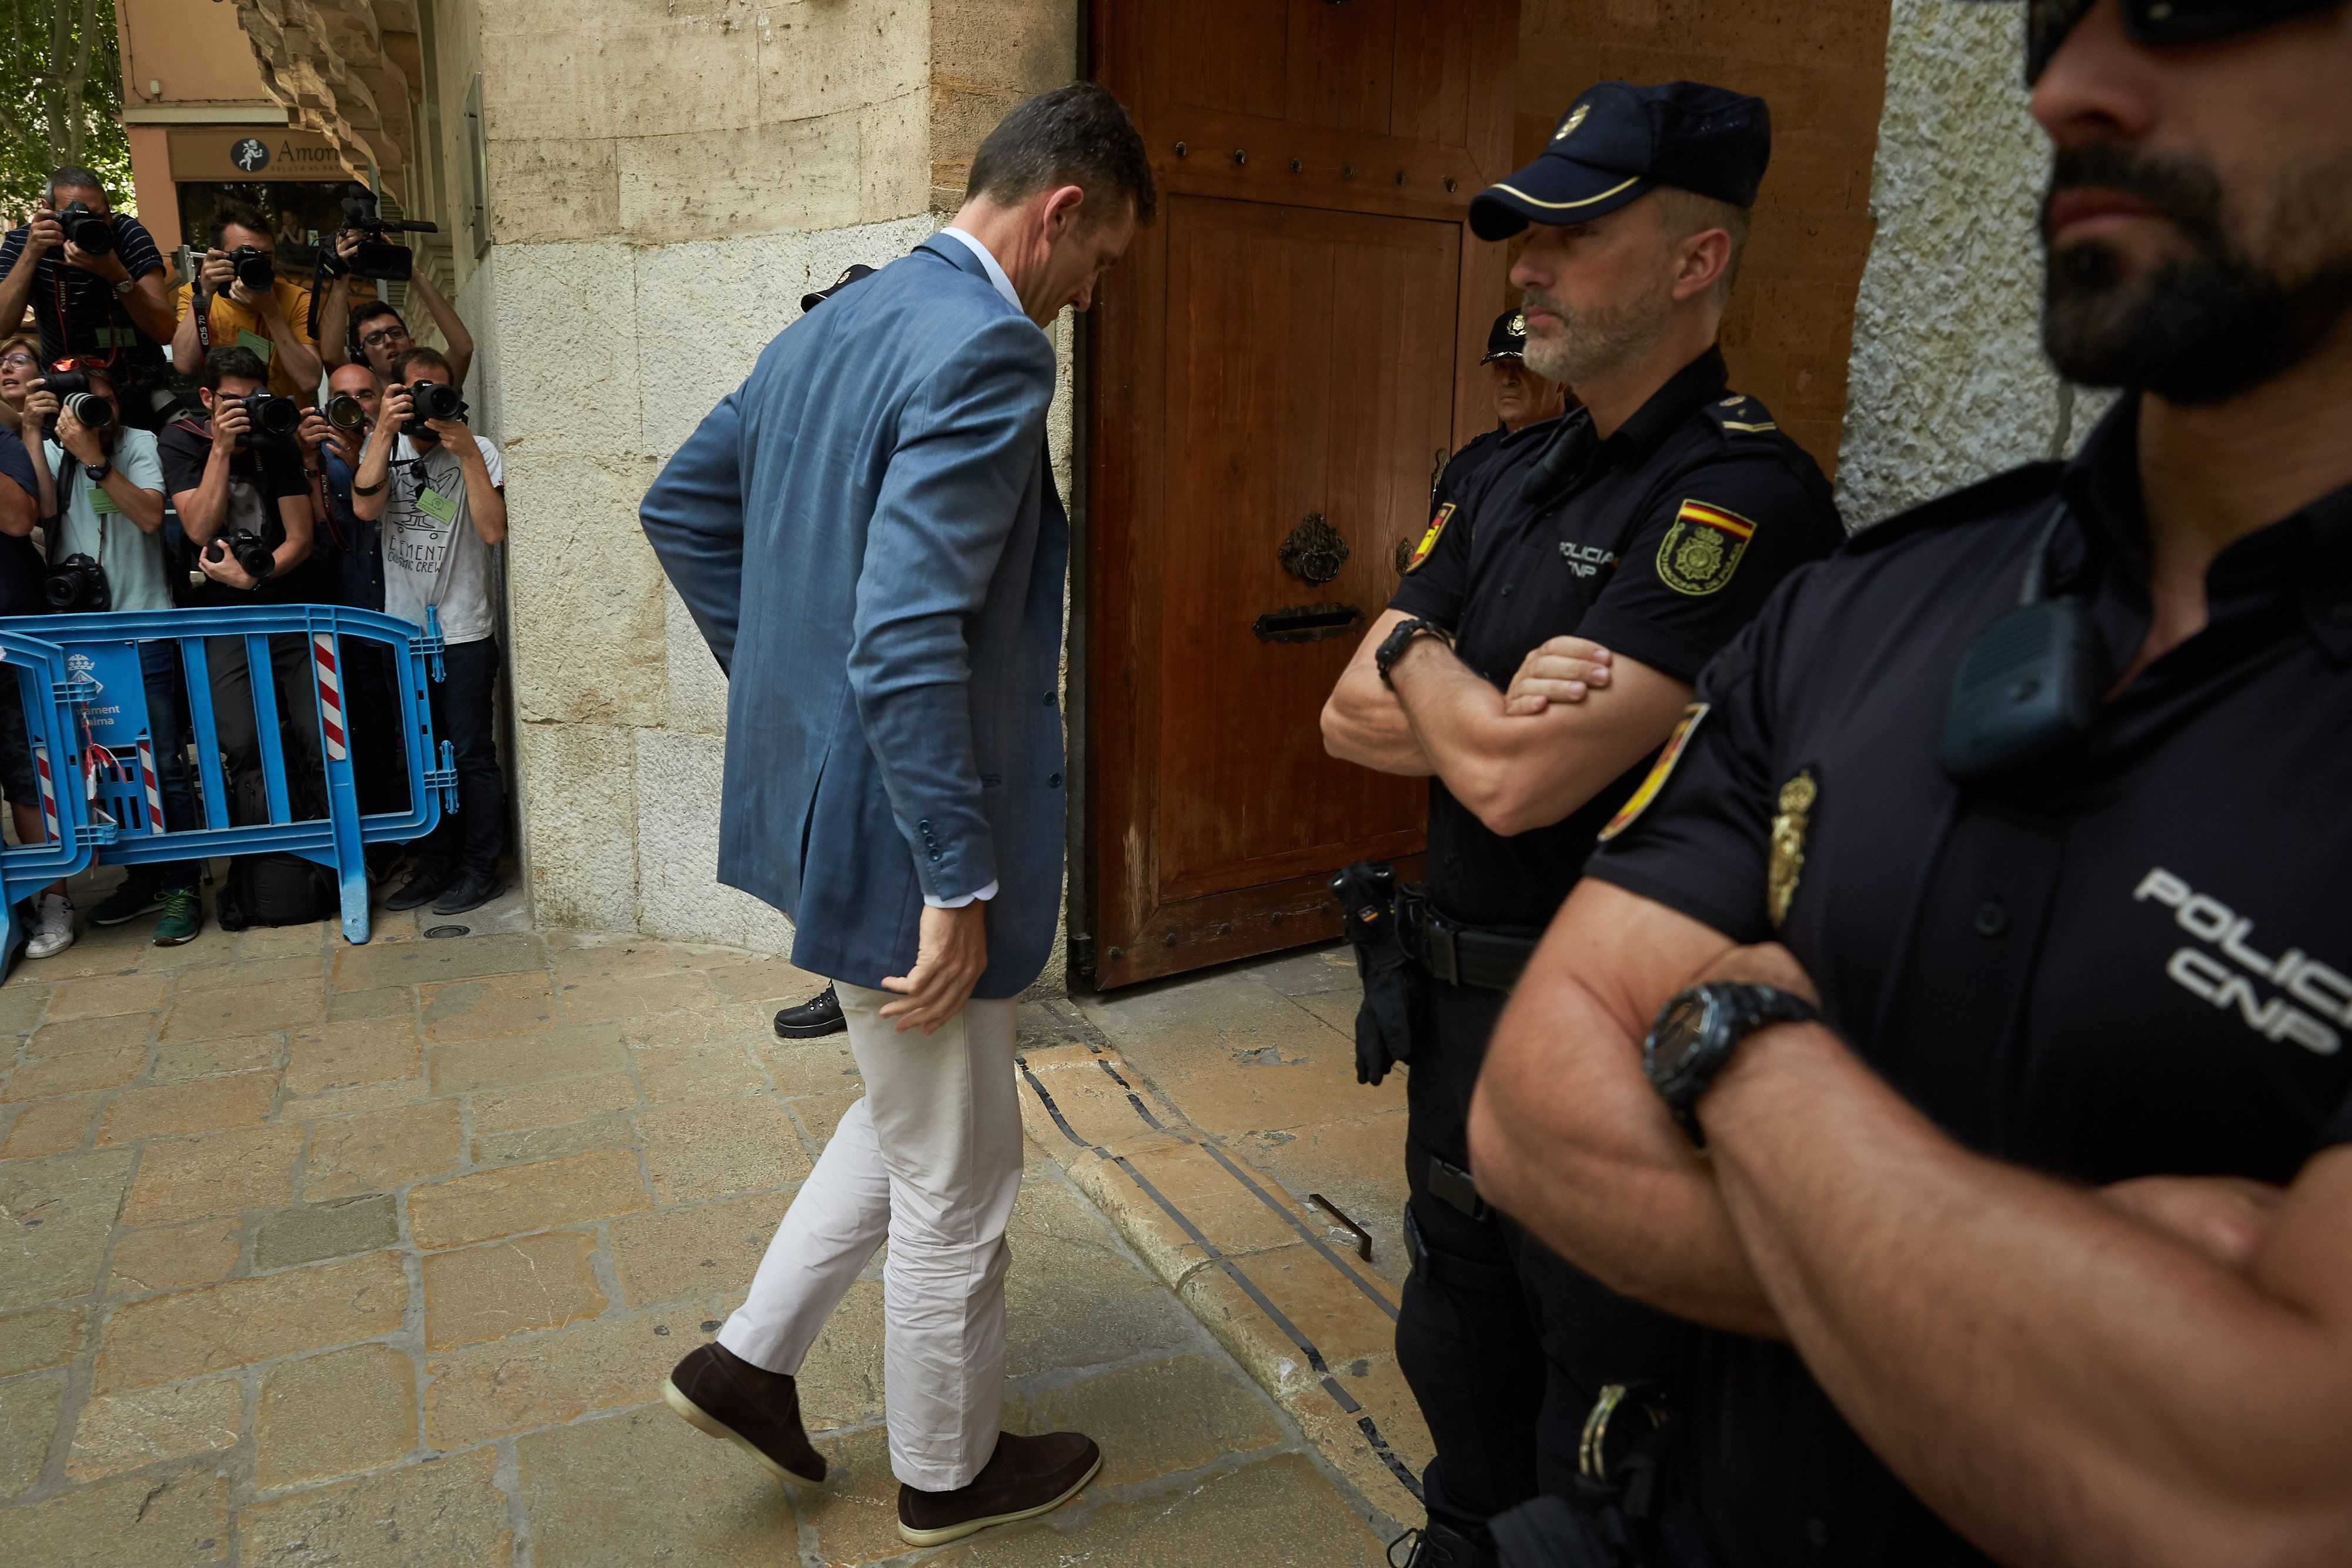 Le beau-frère du roi d'Espagne, Iñaki Urdangarin,